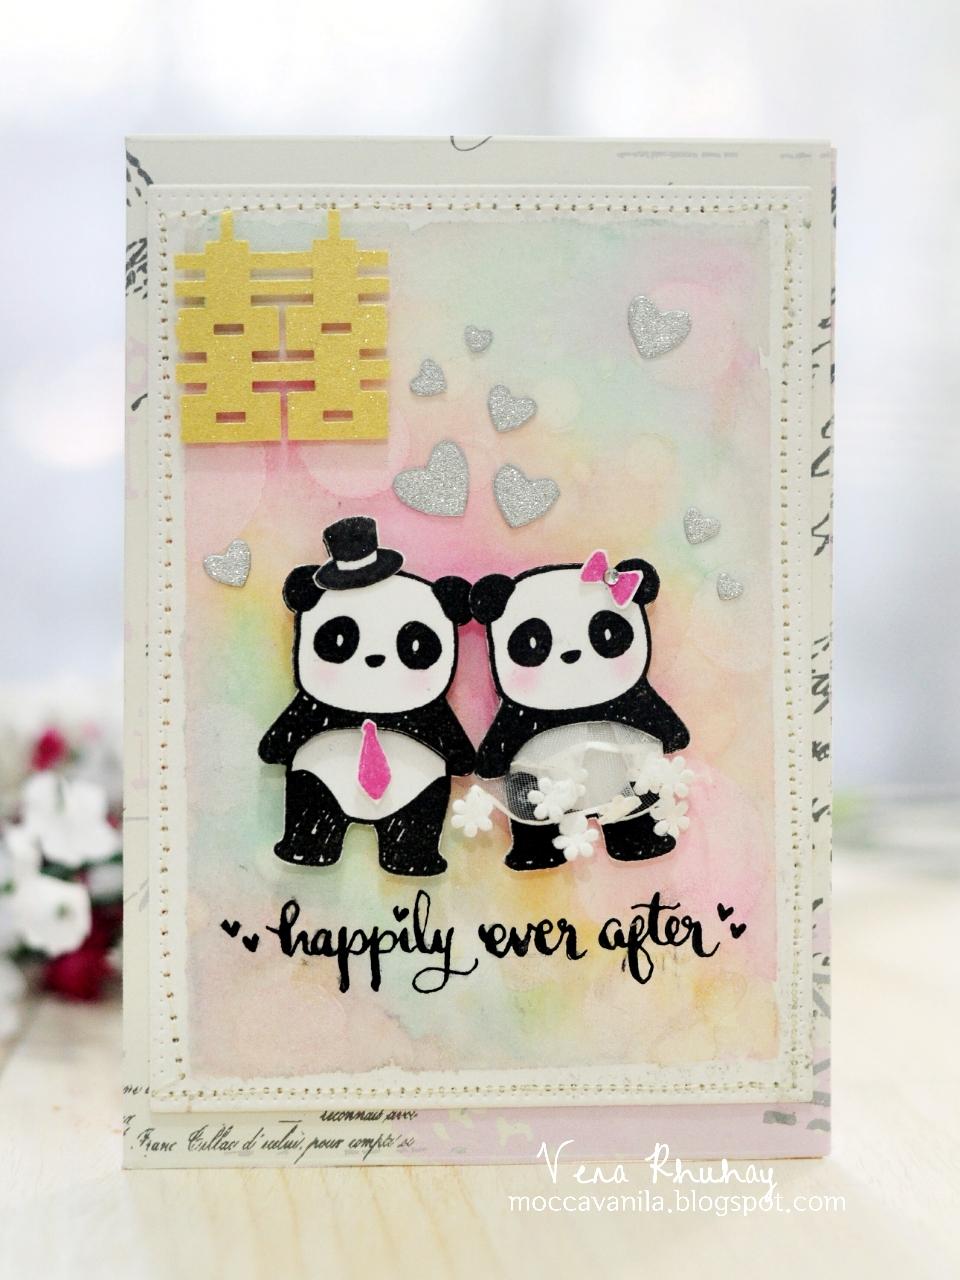 moccavanila by vera rhuhay 2in1 panda wedding card